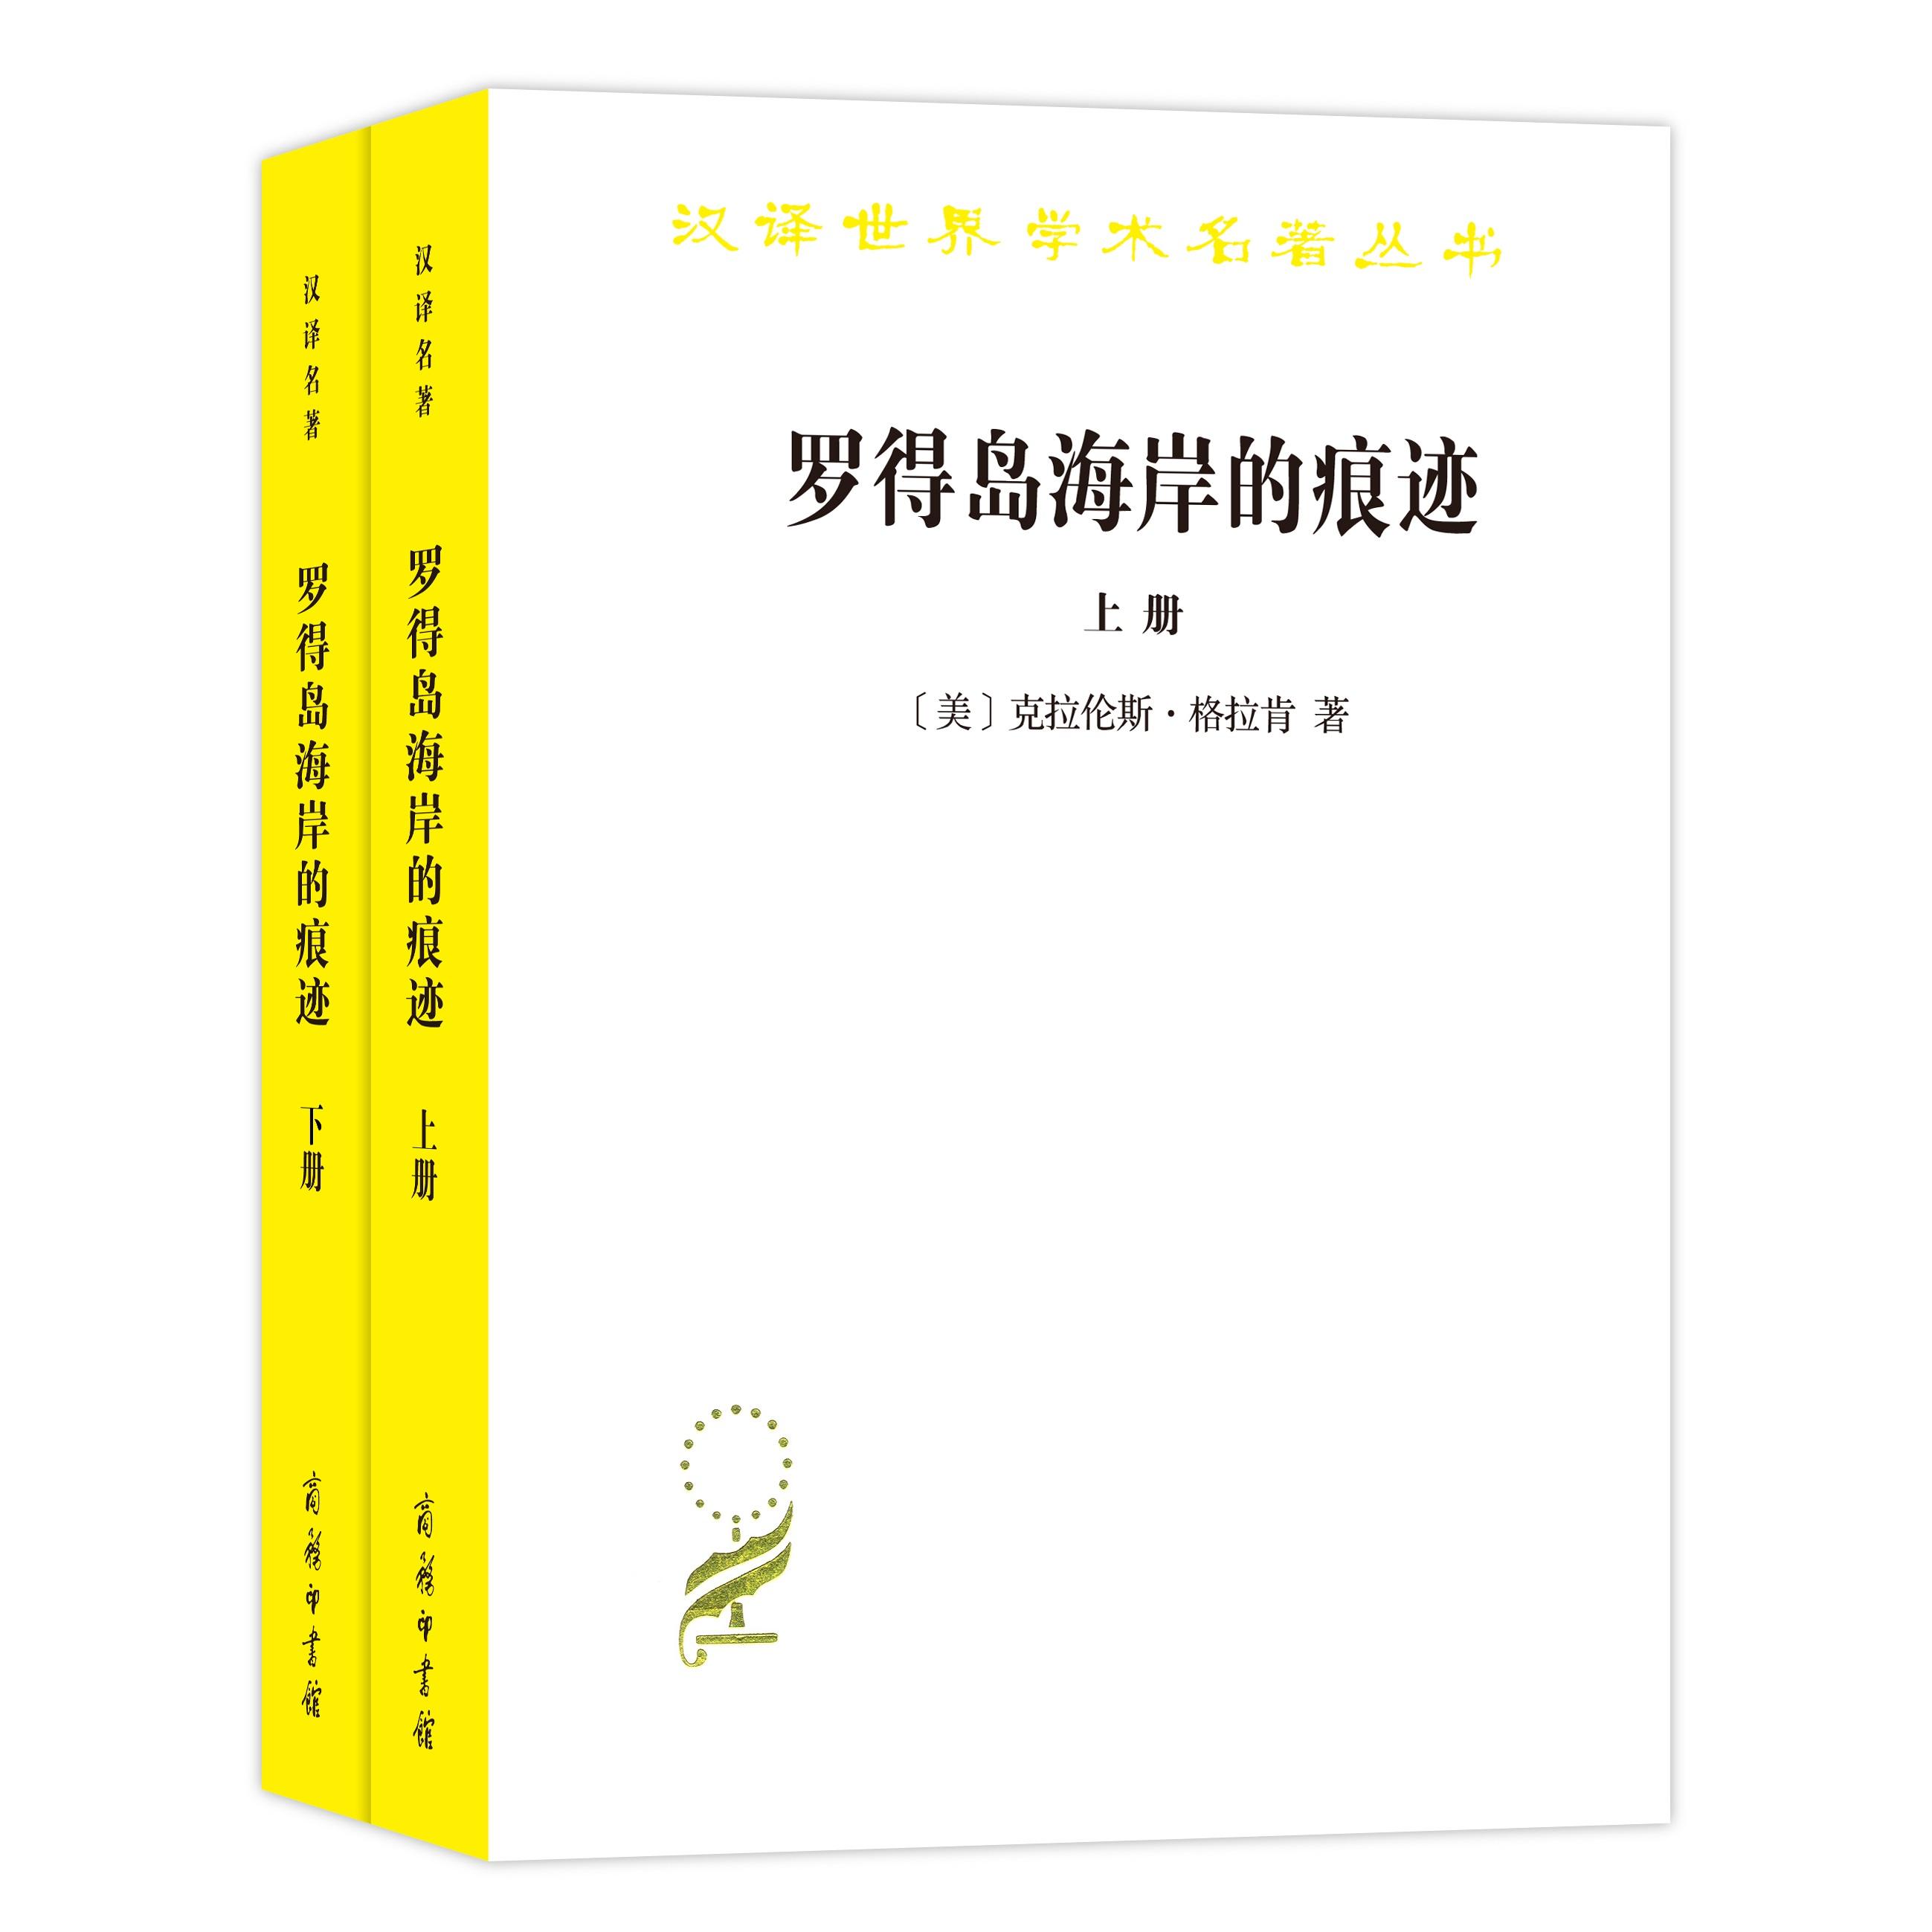 http://www.cp.com.cn/UpLoadFile/Images/2019/12/10/1049216362c04f02-5.jpg